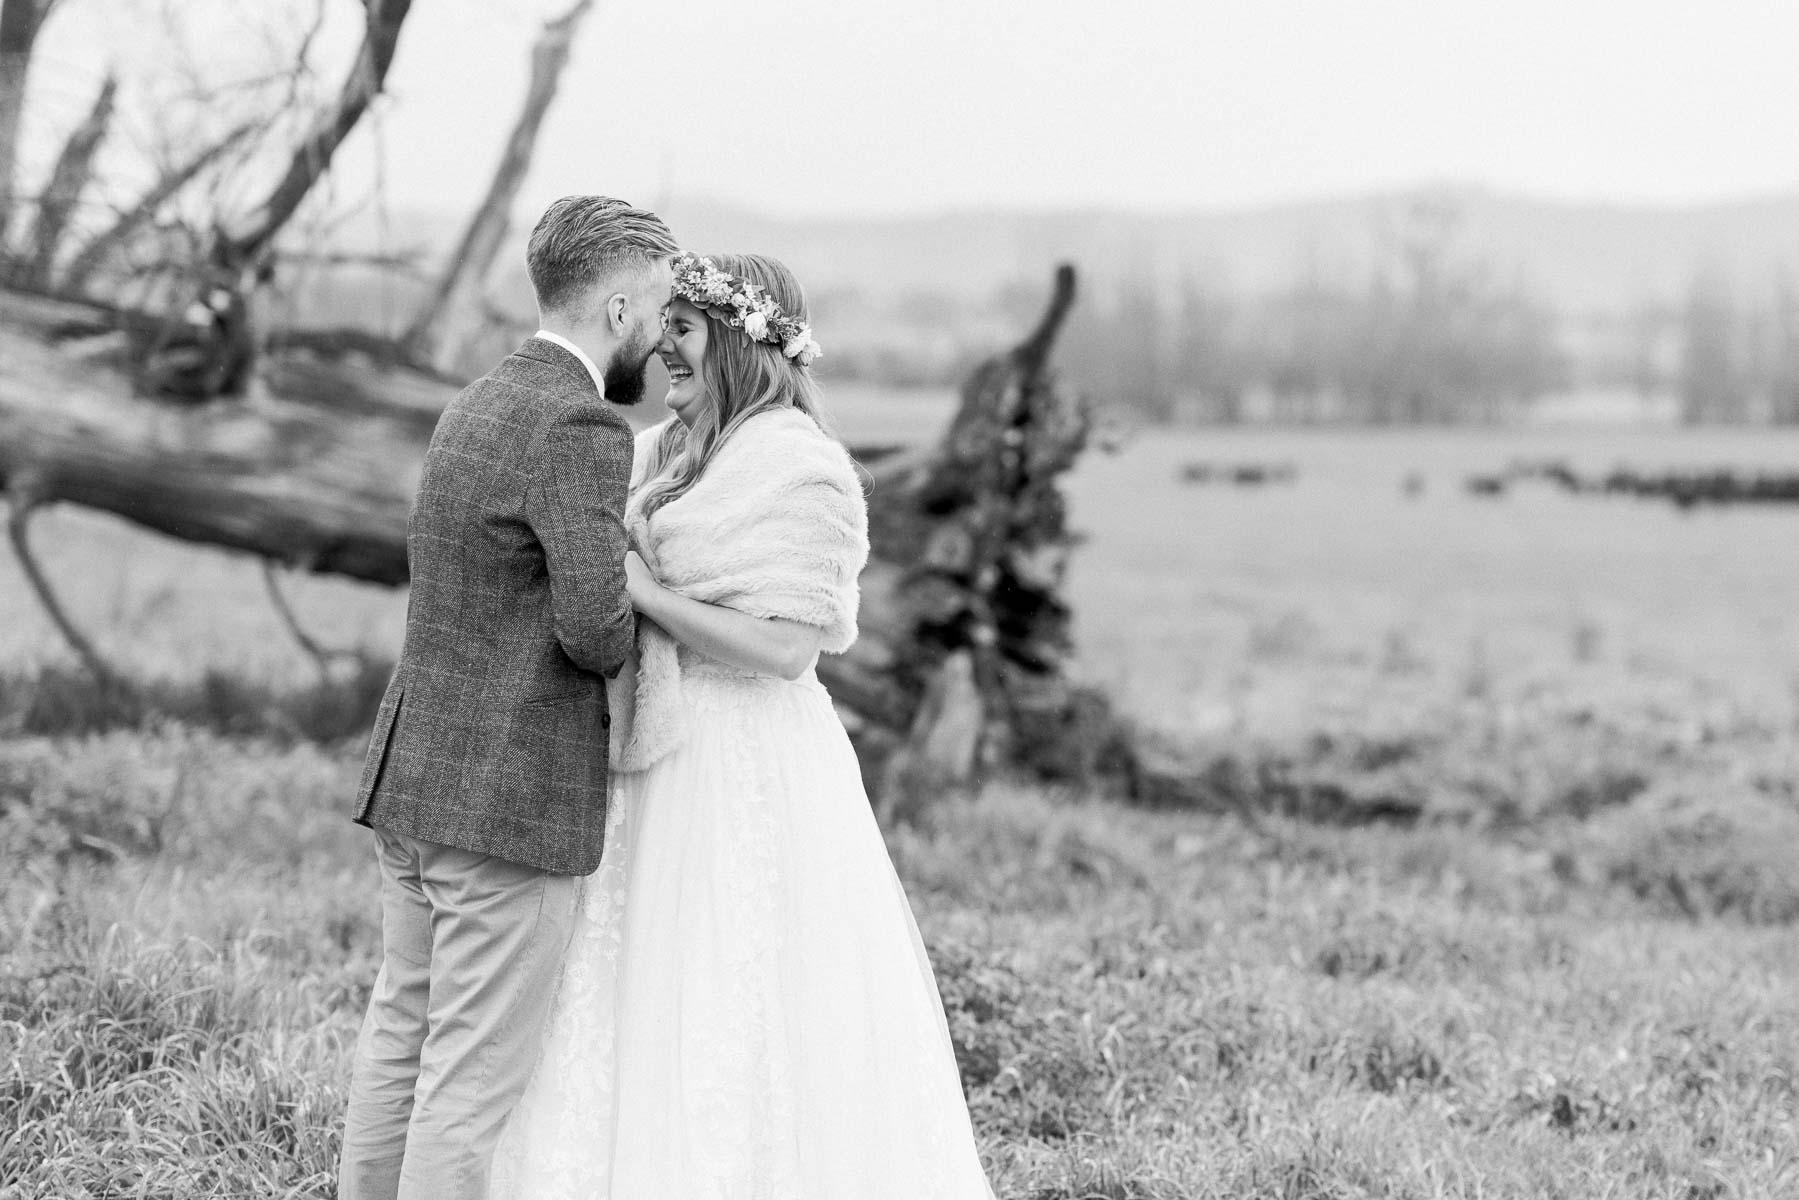 adams-farm-coldstream-yarra-valley-wedding-heart+soul-weddings-kel-jarryd-05631.jpg